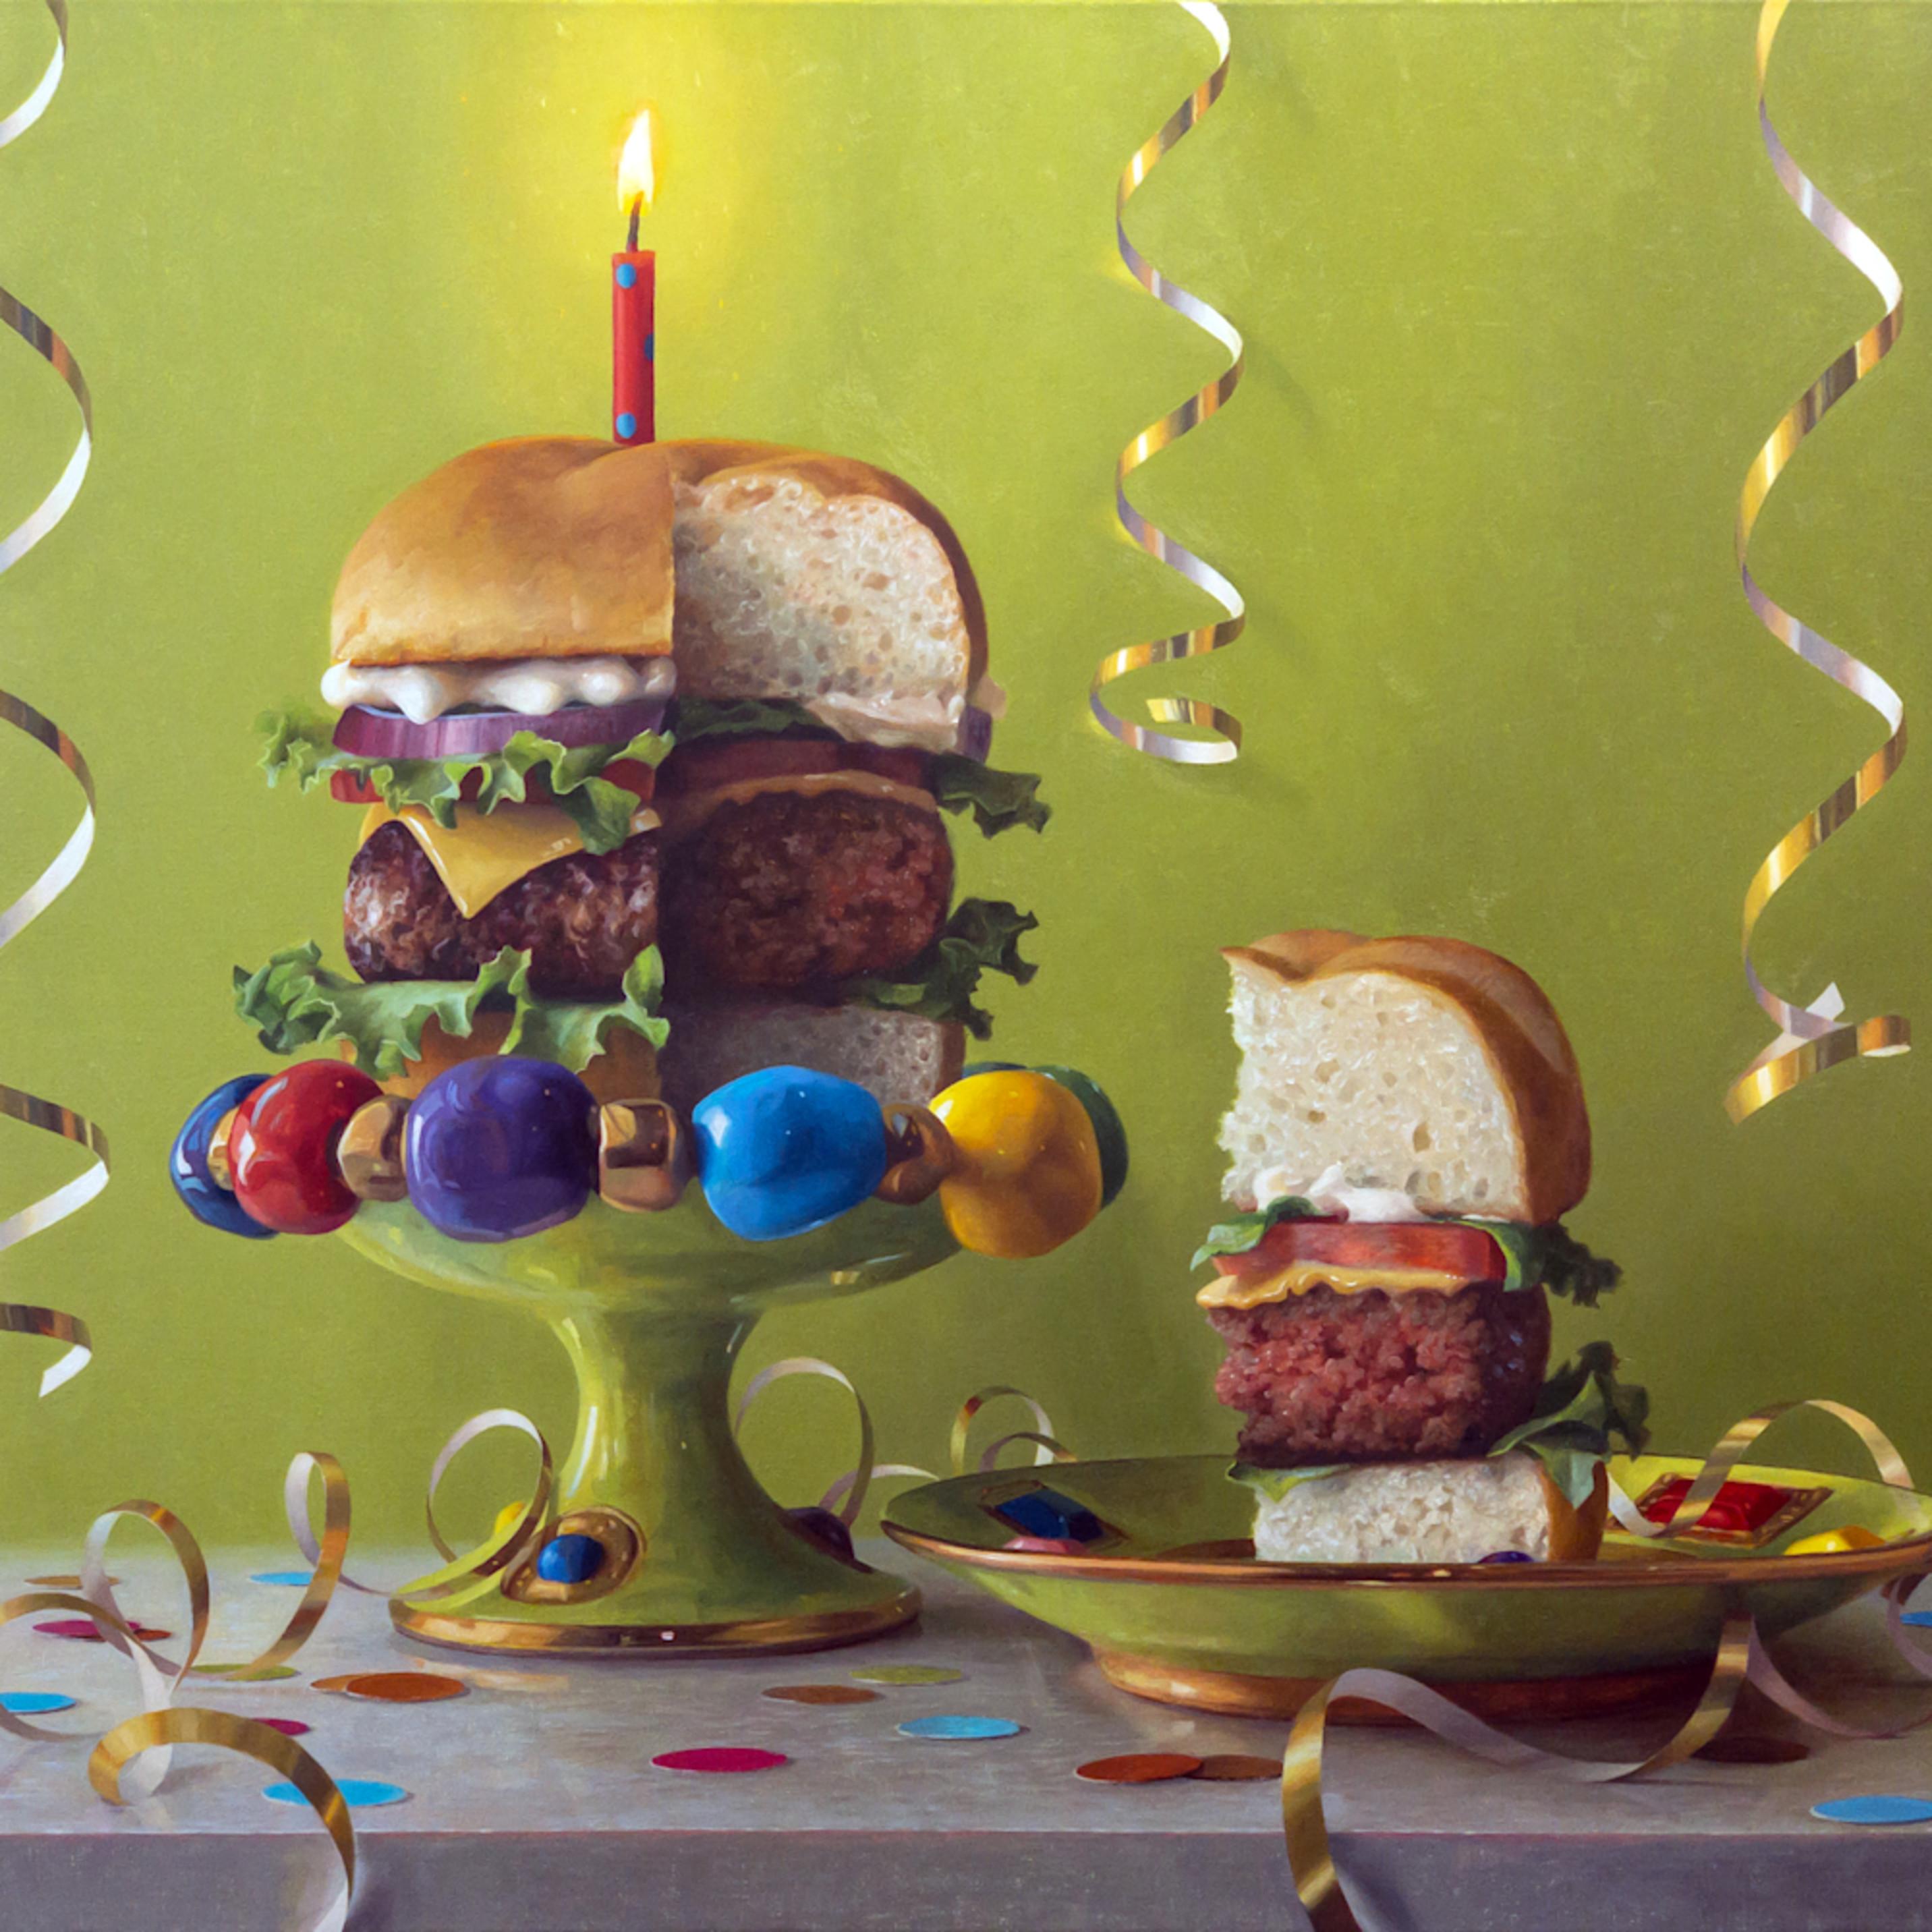 Carols birthday burger r5omng